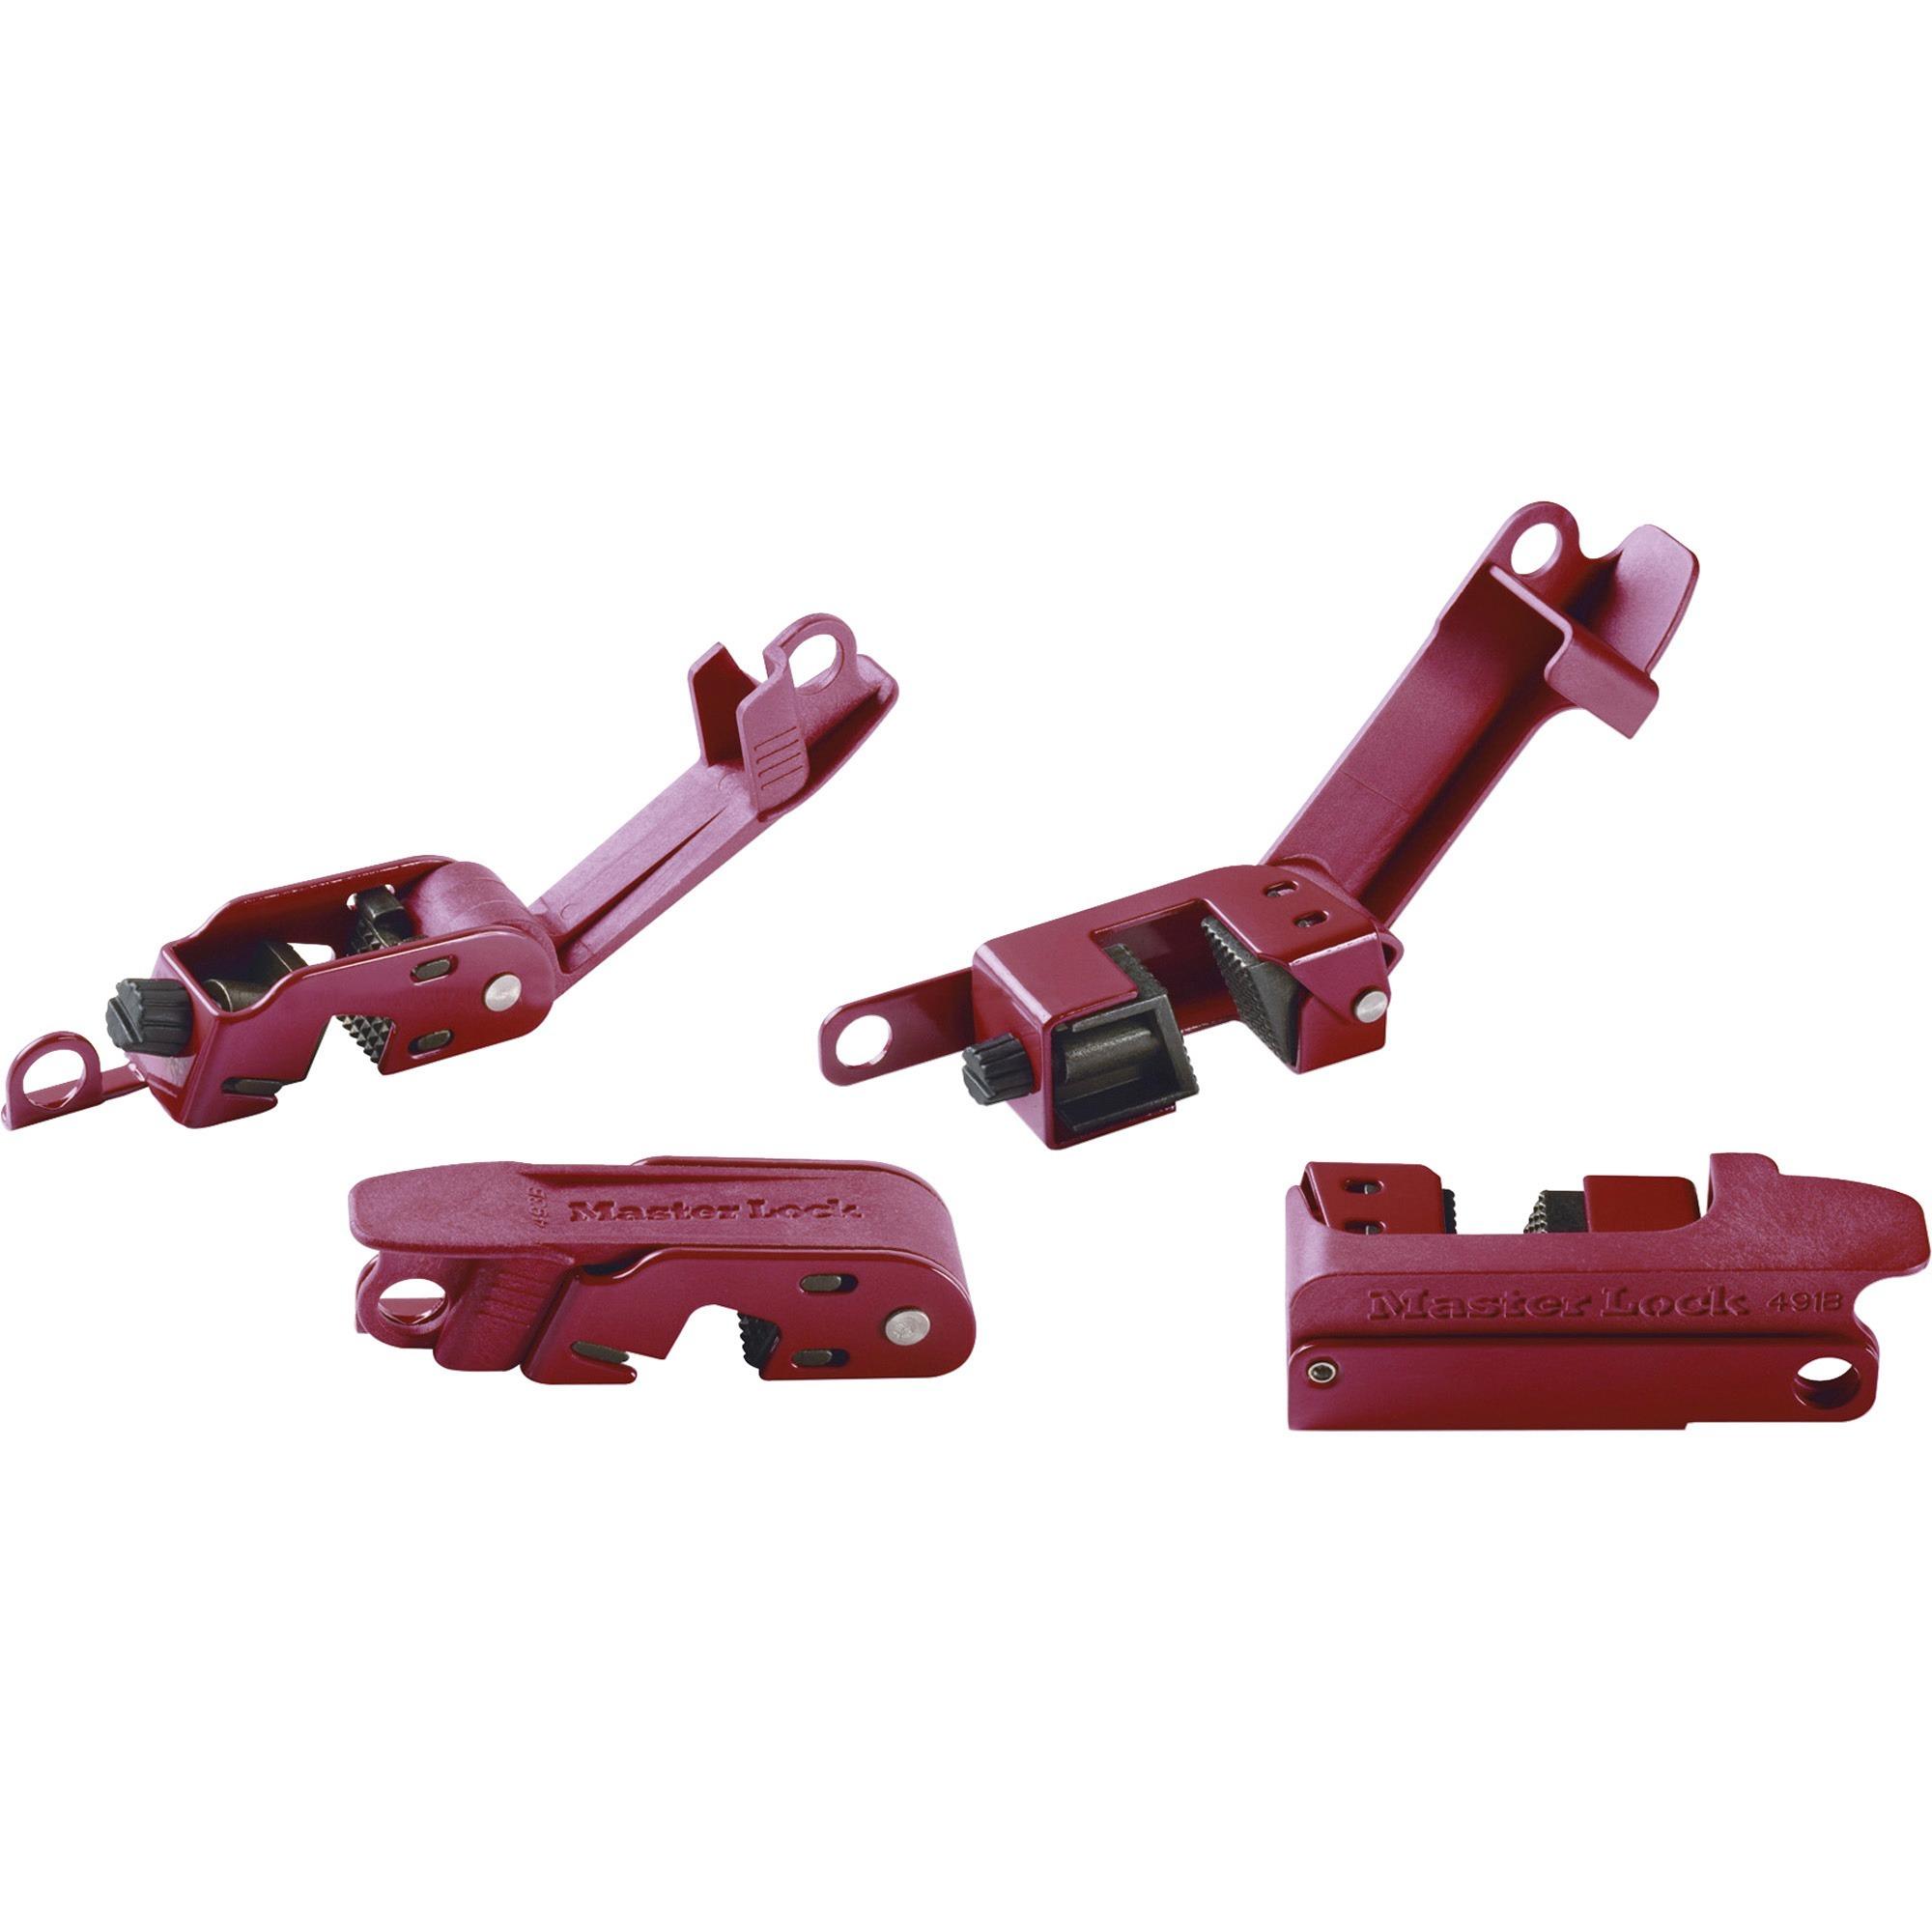 Master Lock, MLK506, Circuit Breaker Lockout Set, 1 Each, Red